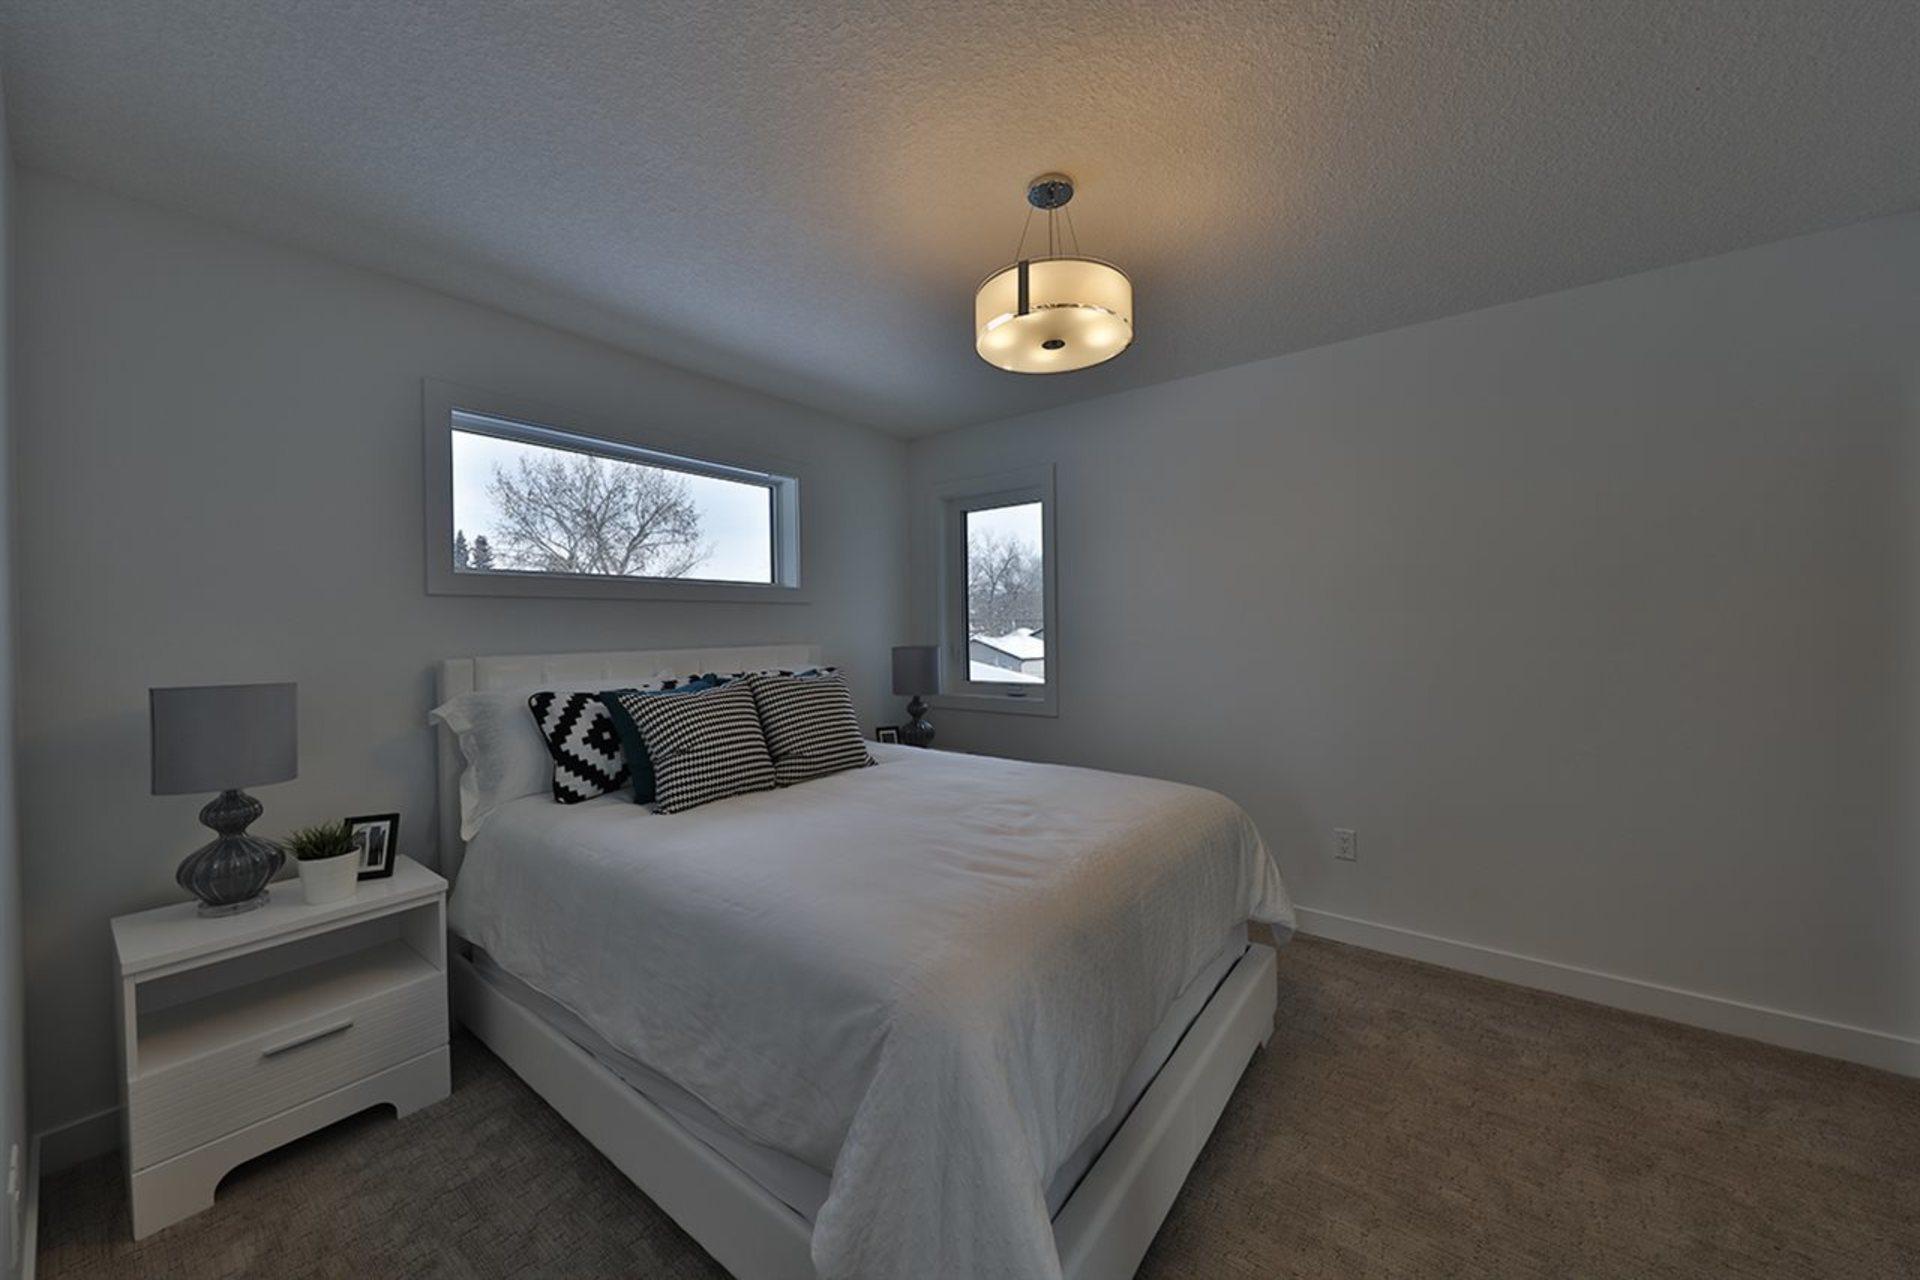 12037-93-street-alberta-avenue-edmonton-09 at 12037 93 Street, Alberta Avenue, Edmonton